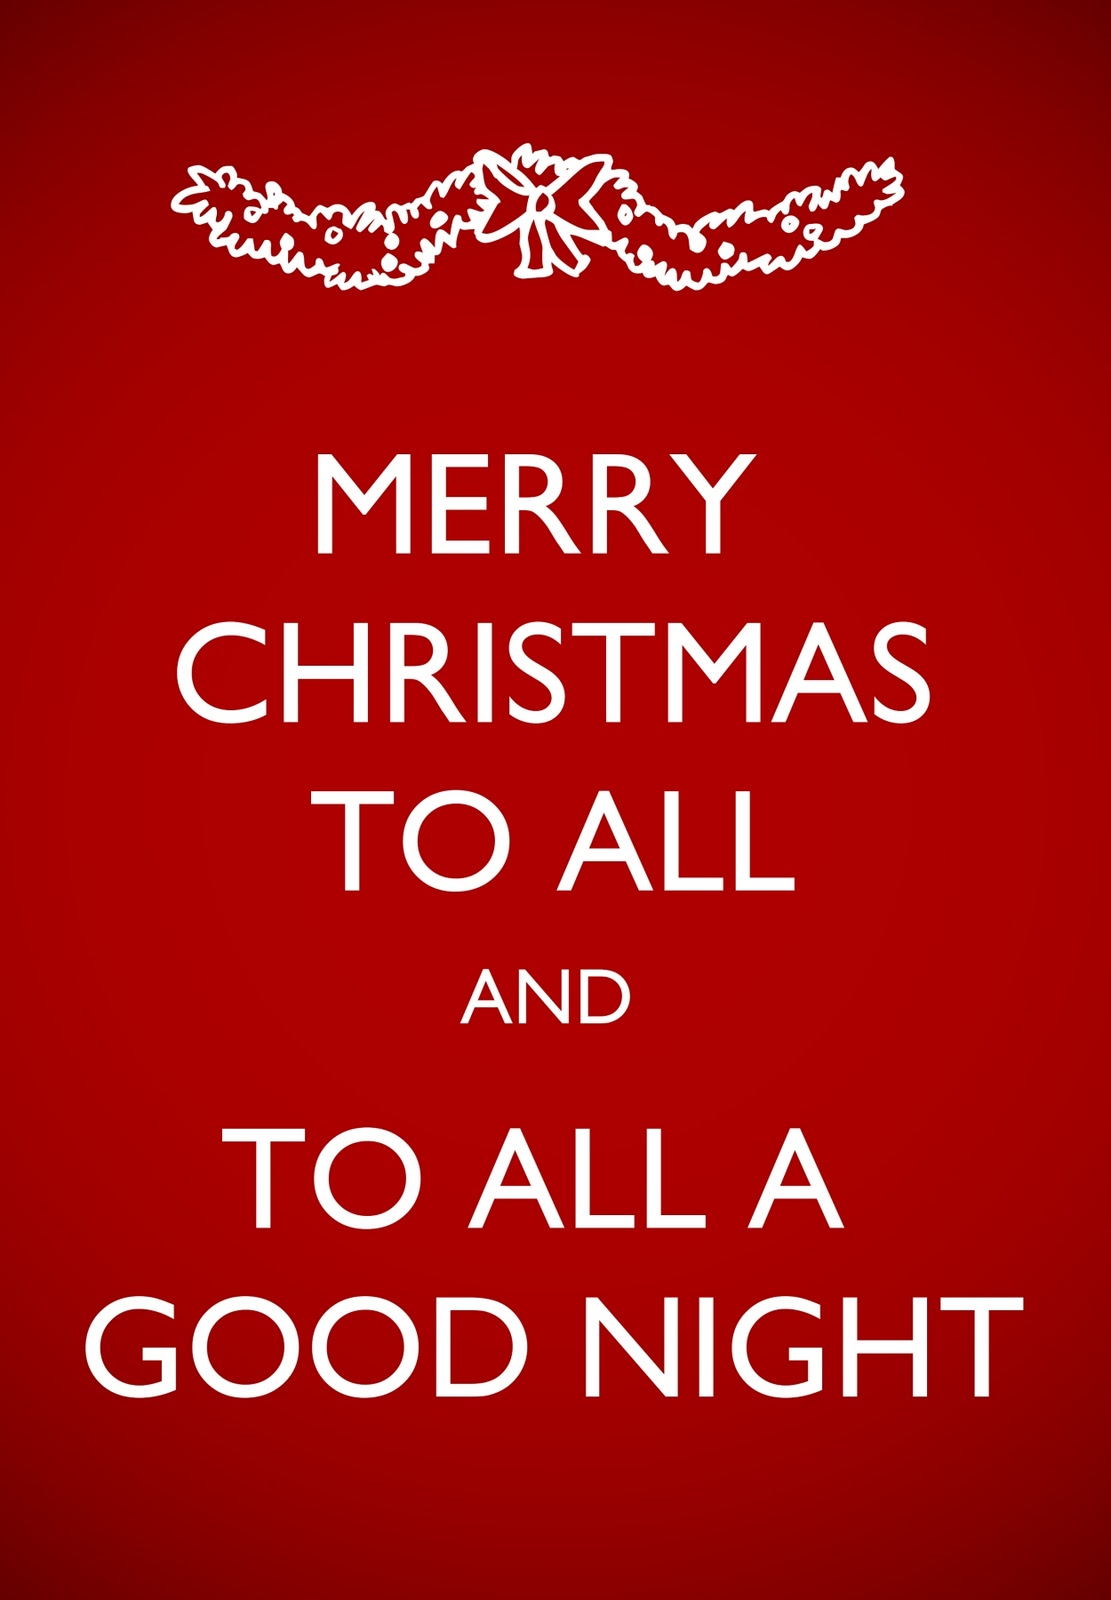 Agape Love Designs Merry Christmas to All Printables